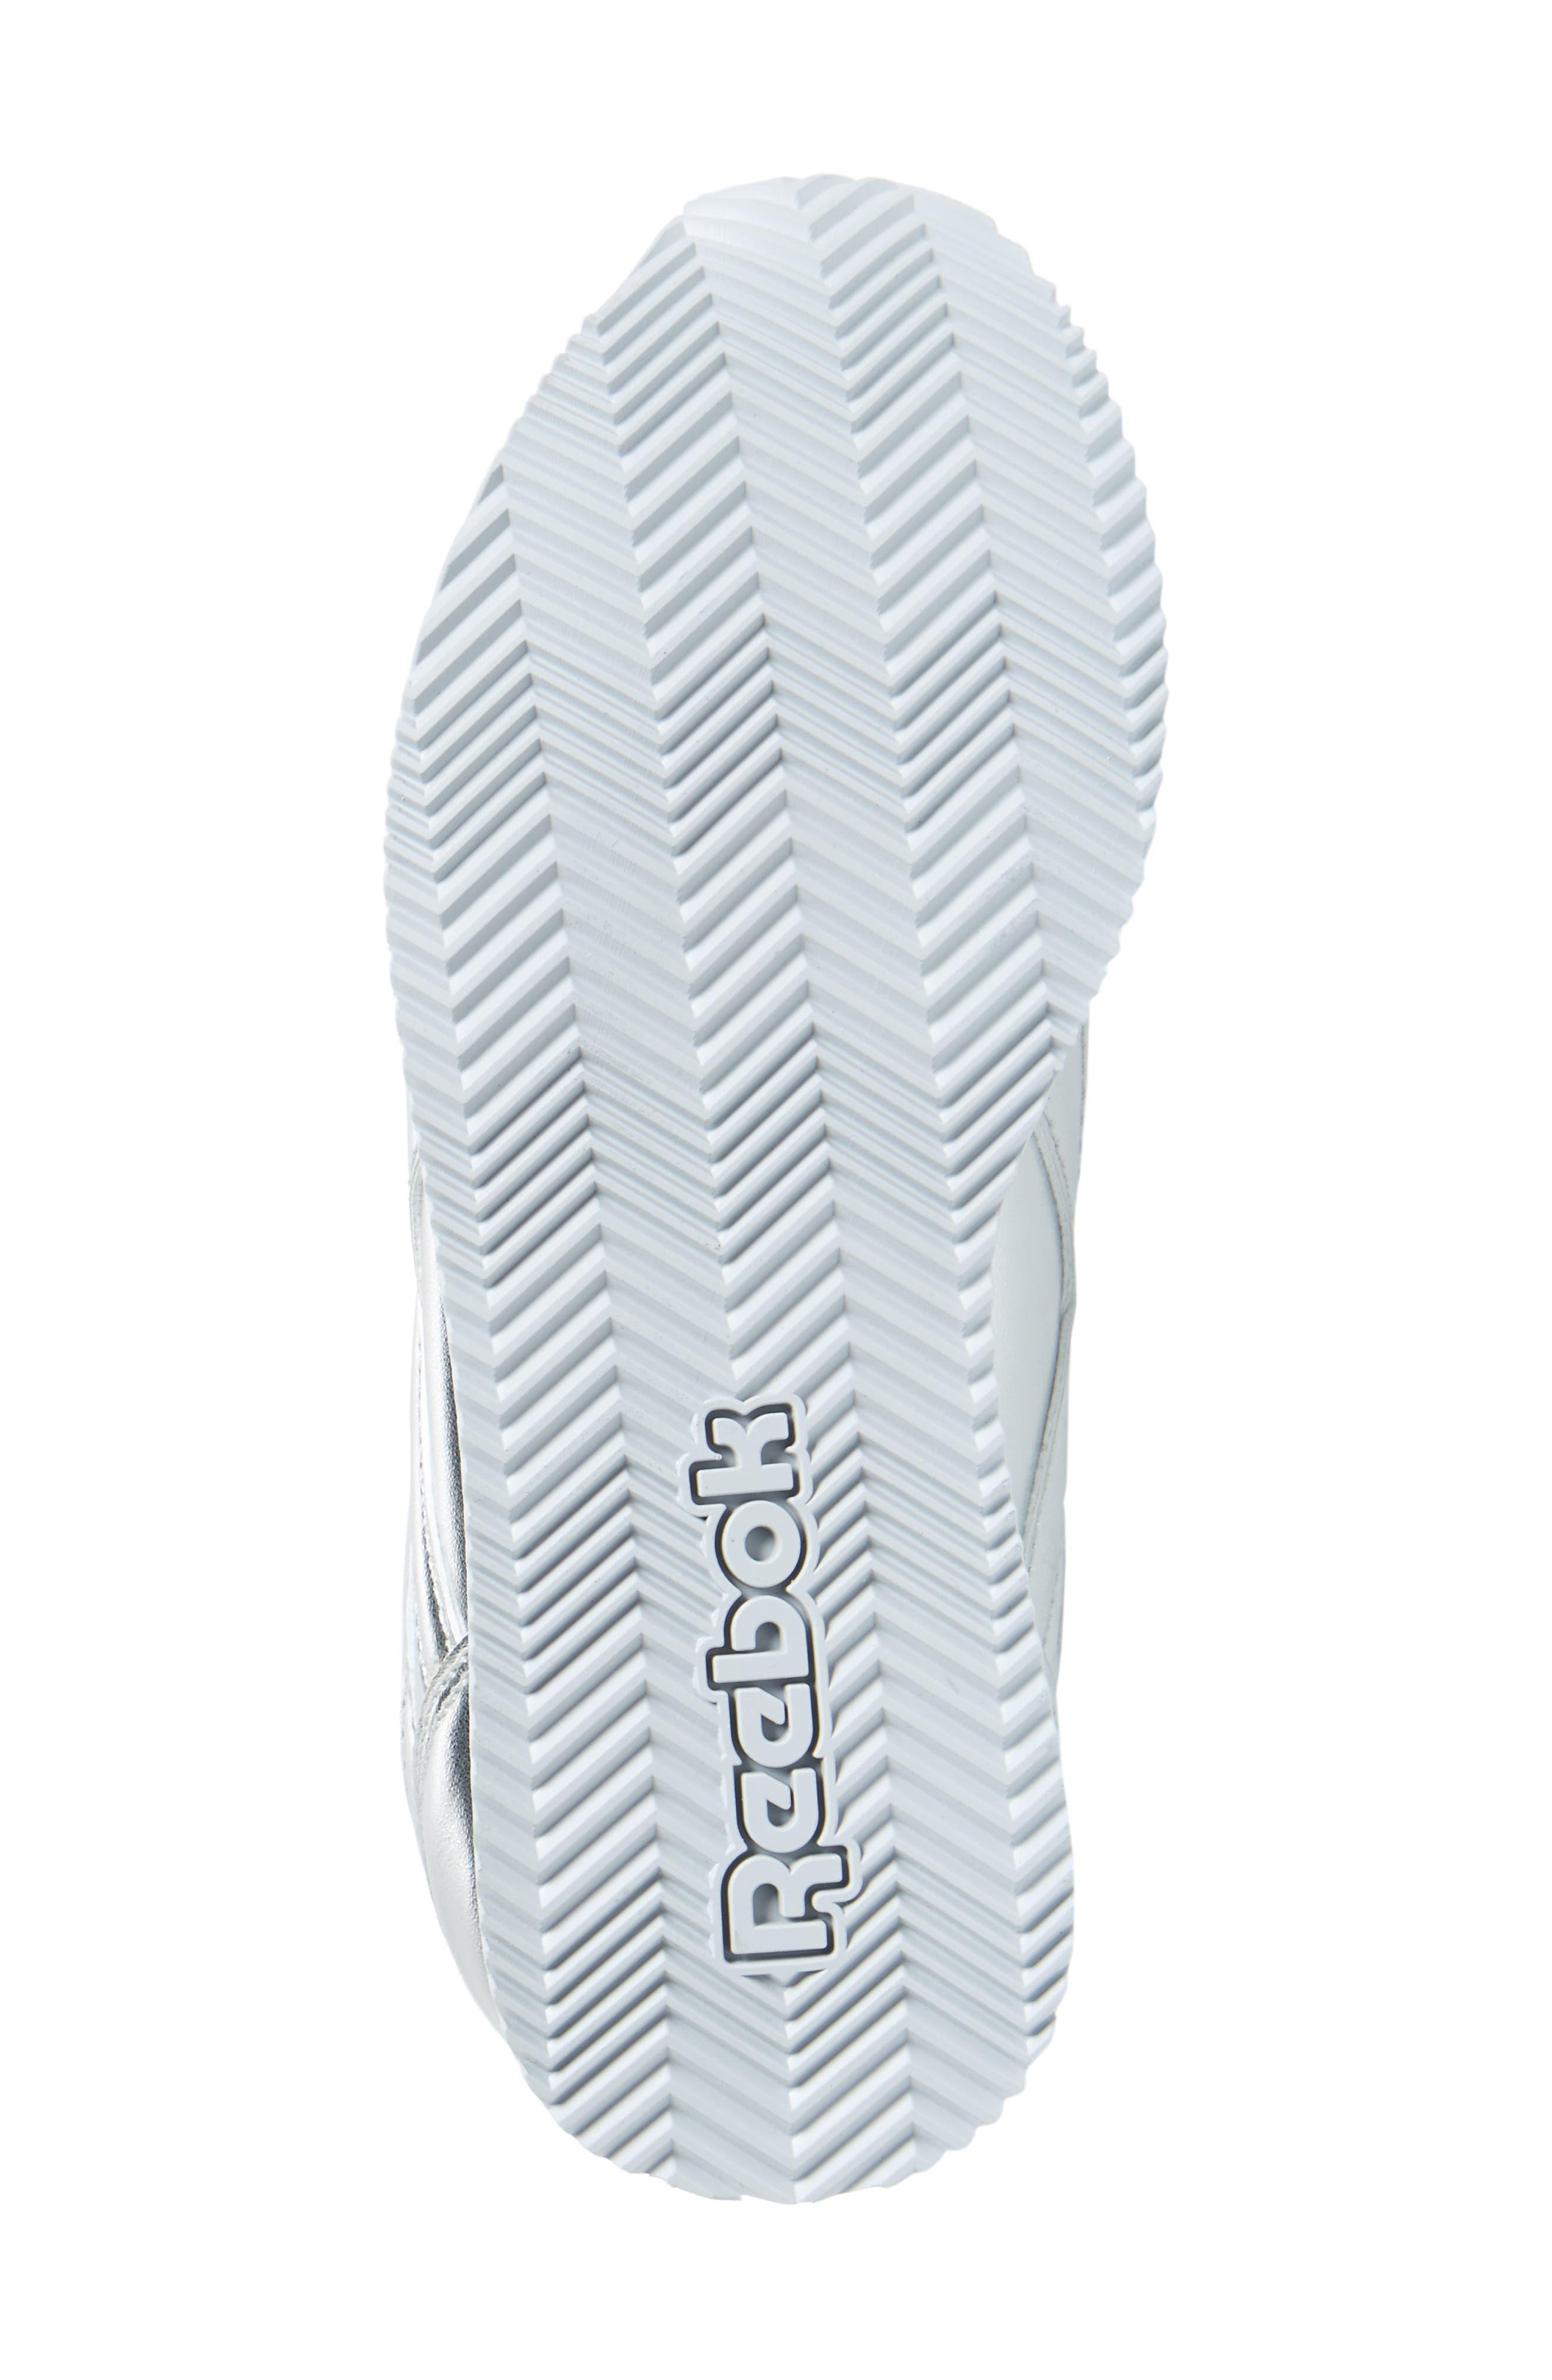 Royal Classic Jogger 2.0 Sneaker,                             Alternate thumbnail 6, color,                             Silver Metallic/ White